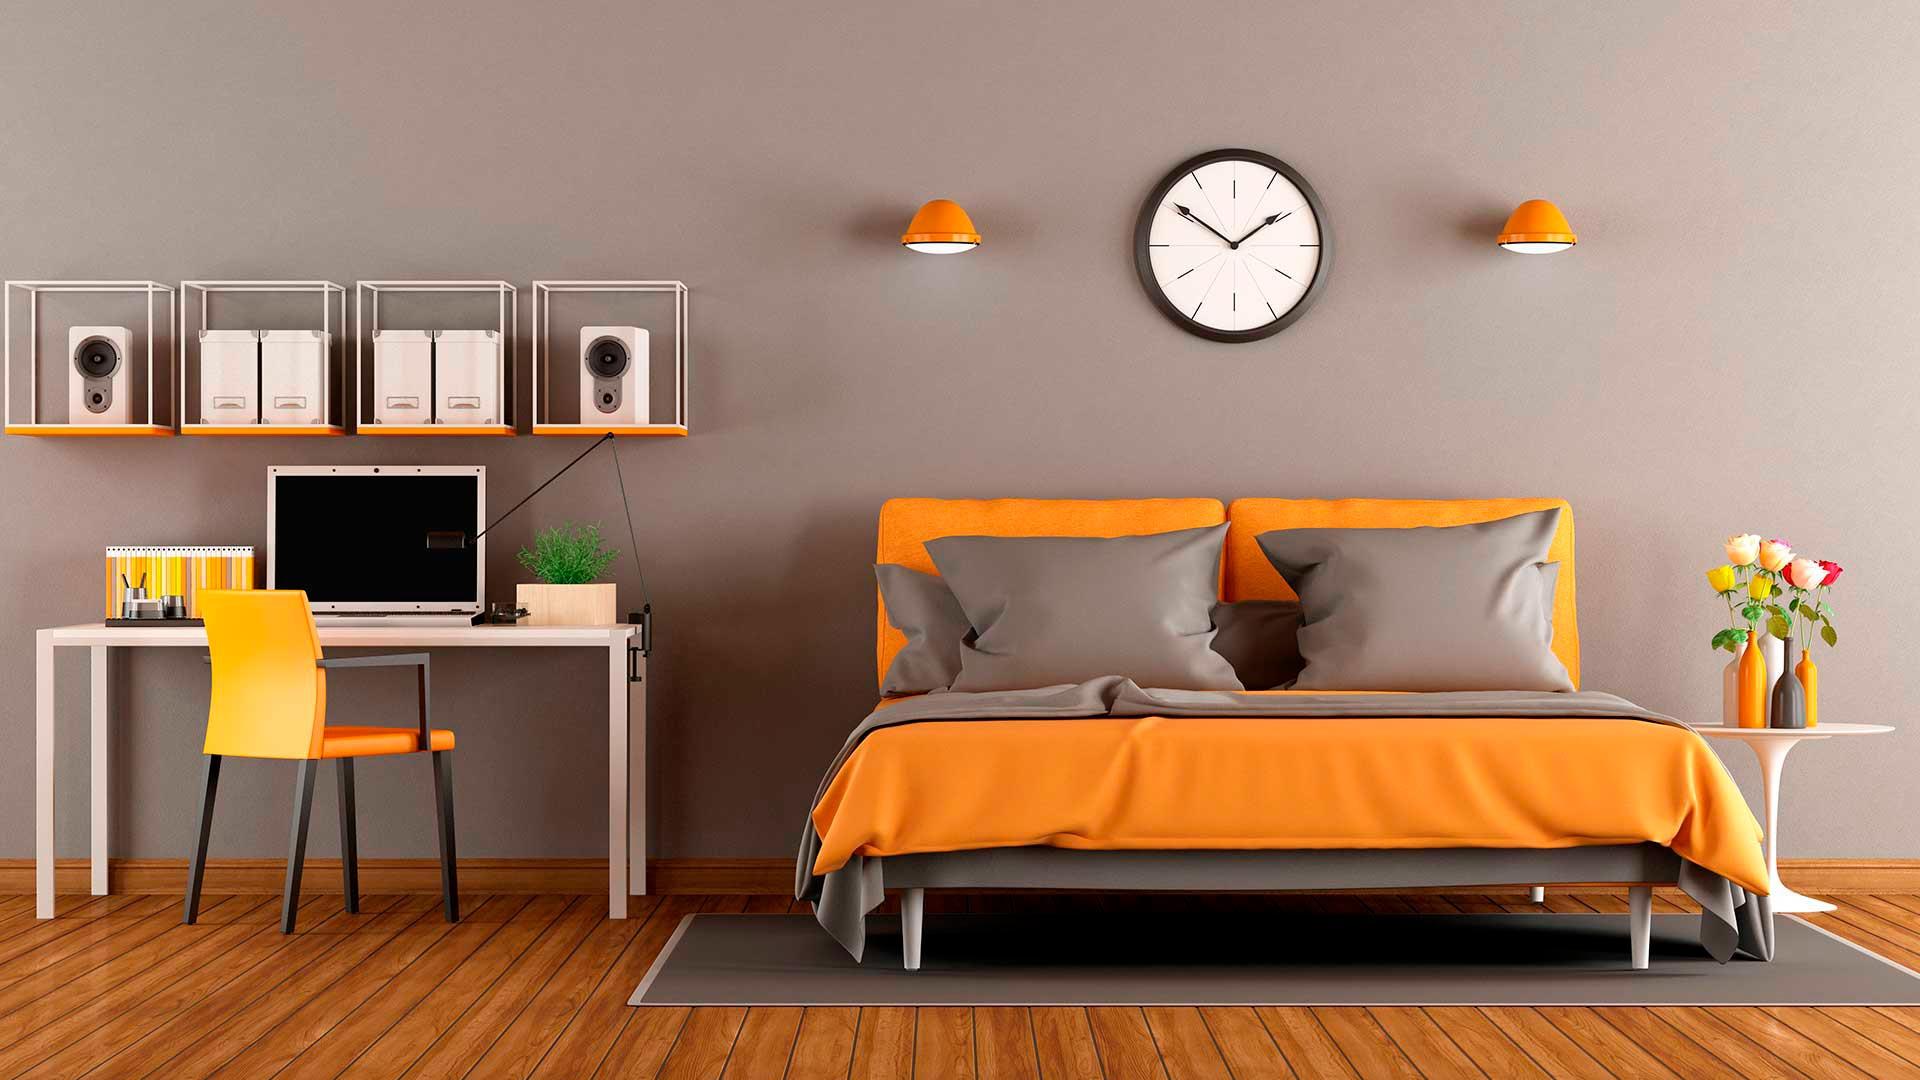 Ejemplos-de-Render-3D-Render-para-Inmobiliarias-imagen-de-pagina-grupoaudiovisual